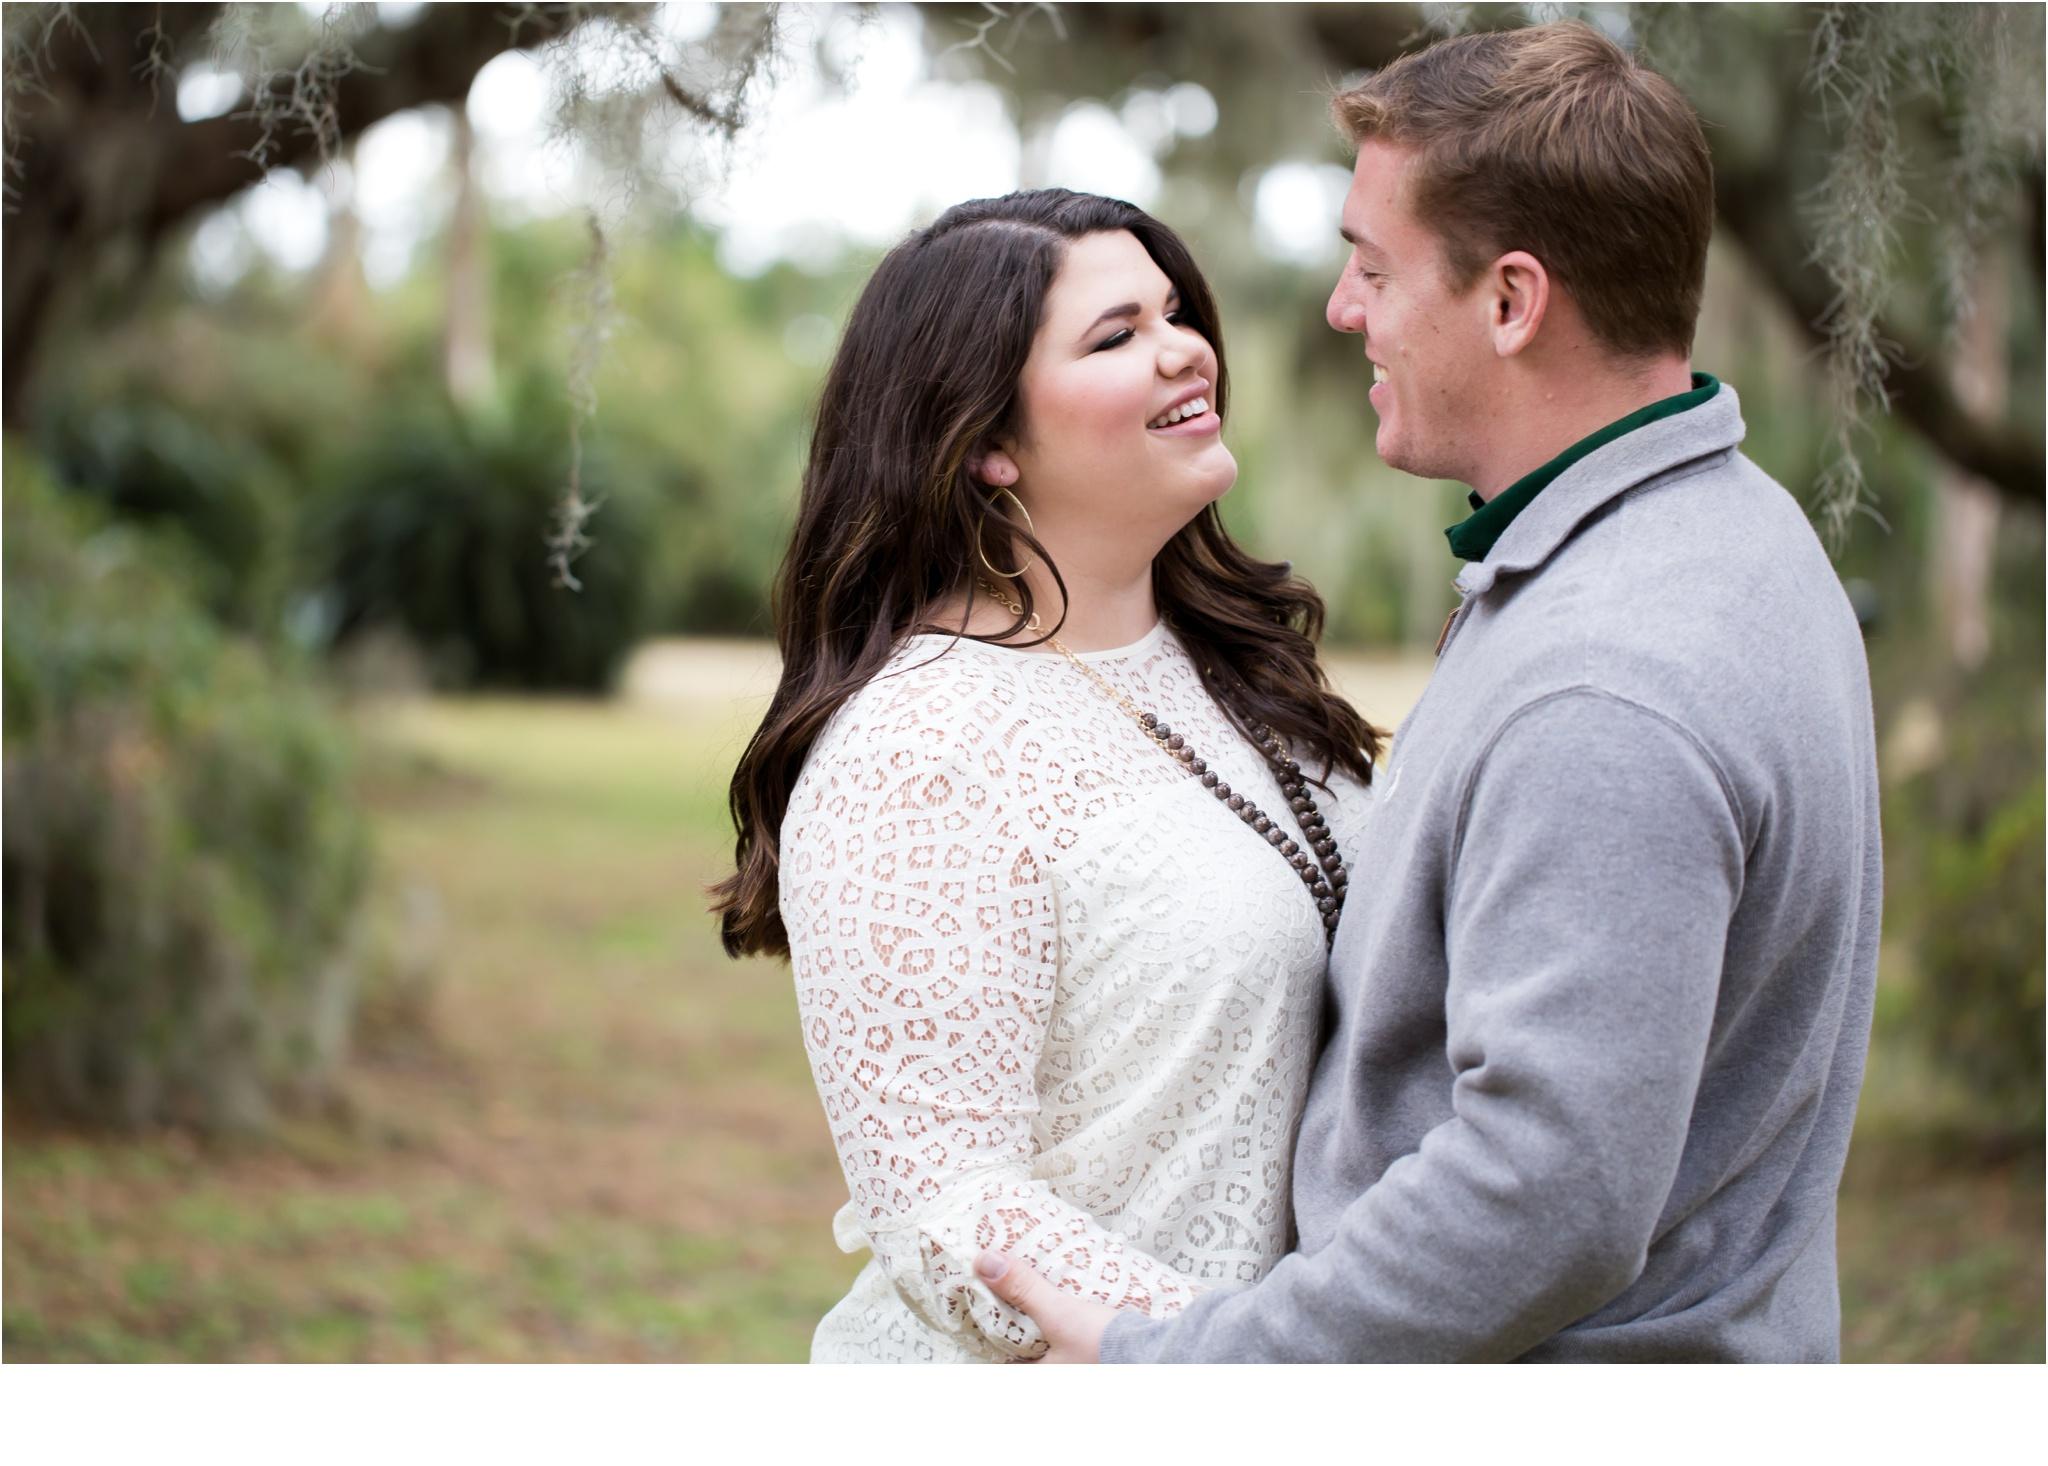 Rainey_Gregg_Photography_St._Simons_Island_Georgia_California_Wedding_Portrait_Photography_0577.jpg